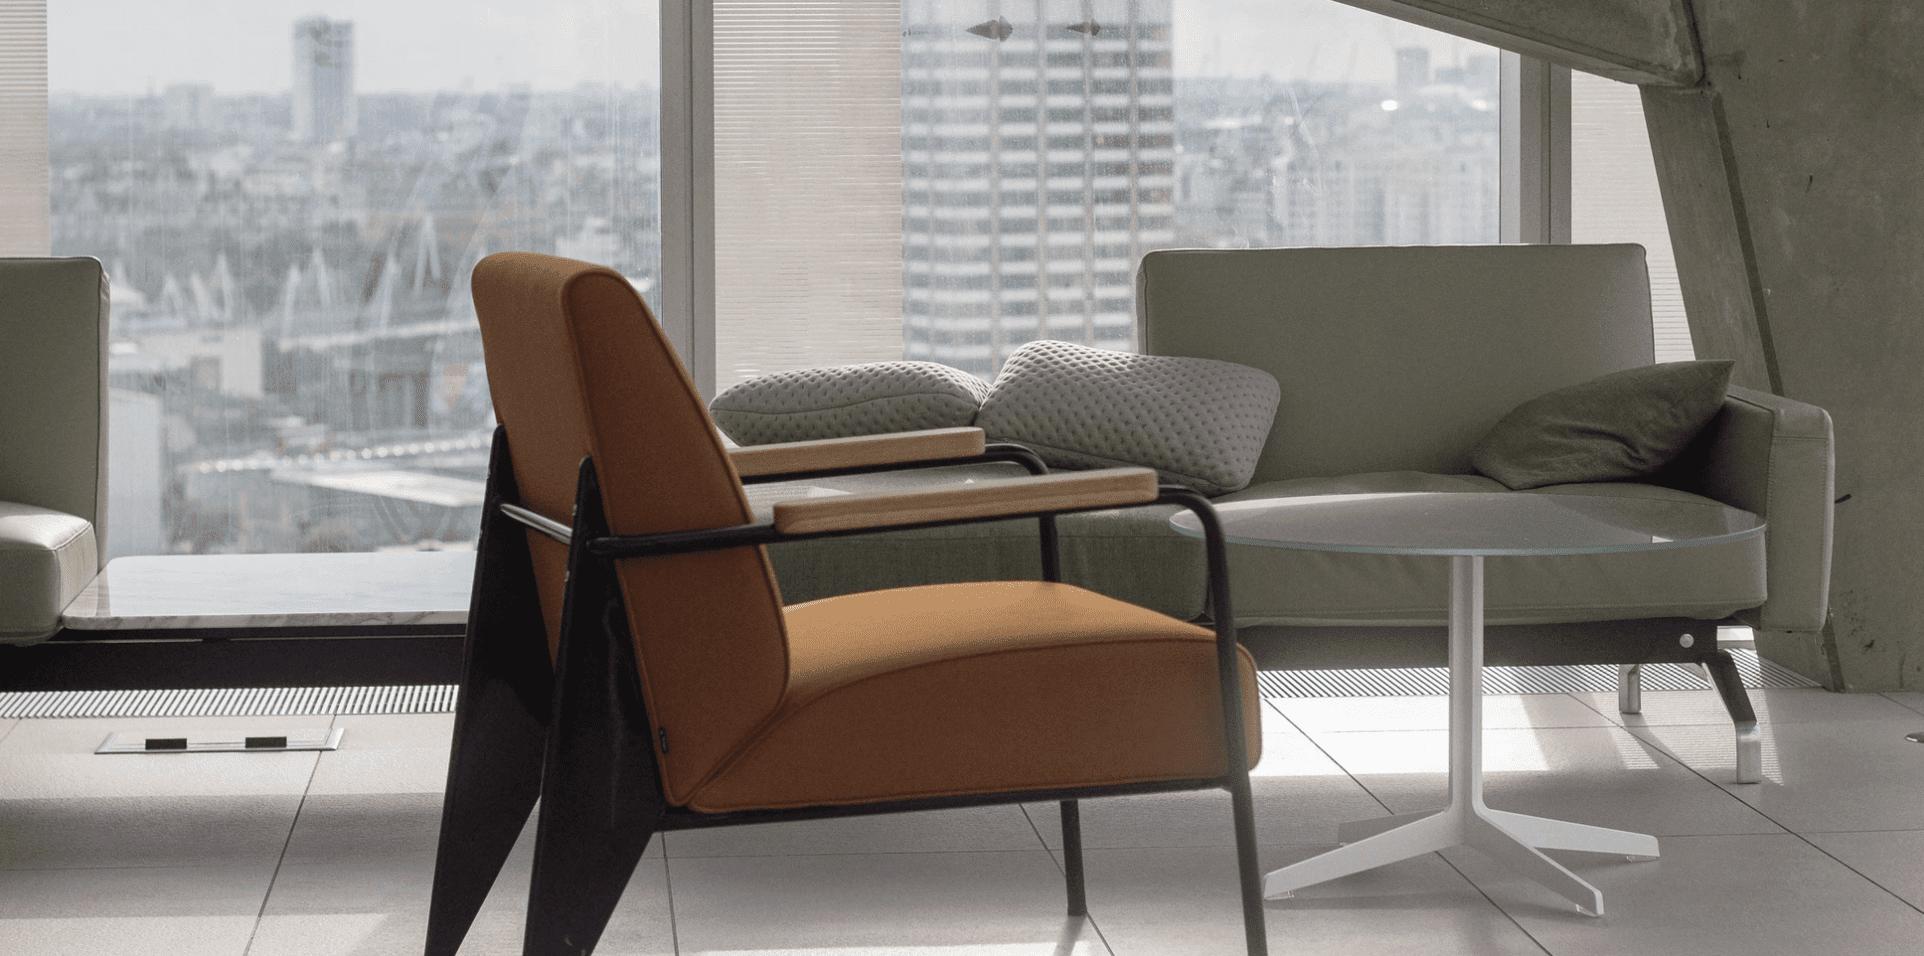 single family office aktien finanzprodukte investoren